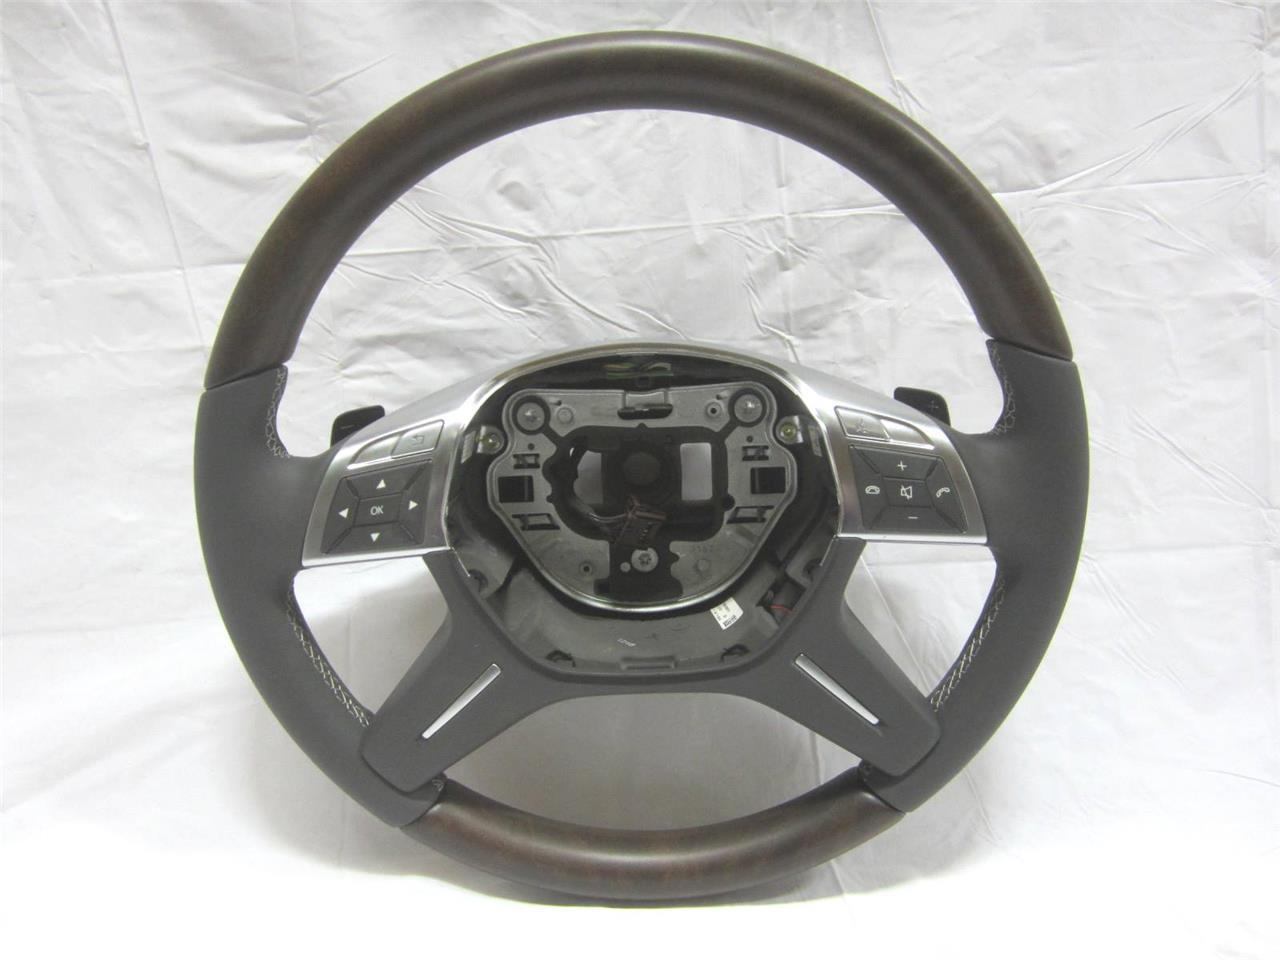 Oem 12 15 mercedes benz m class steering wheel w shift for Mercedes benz wood steering wheel